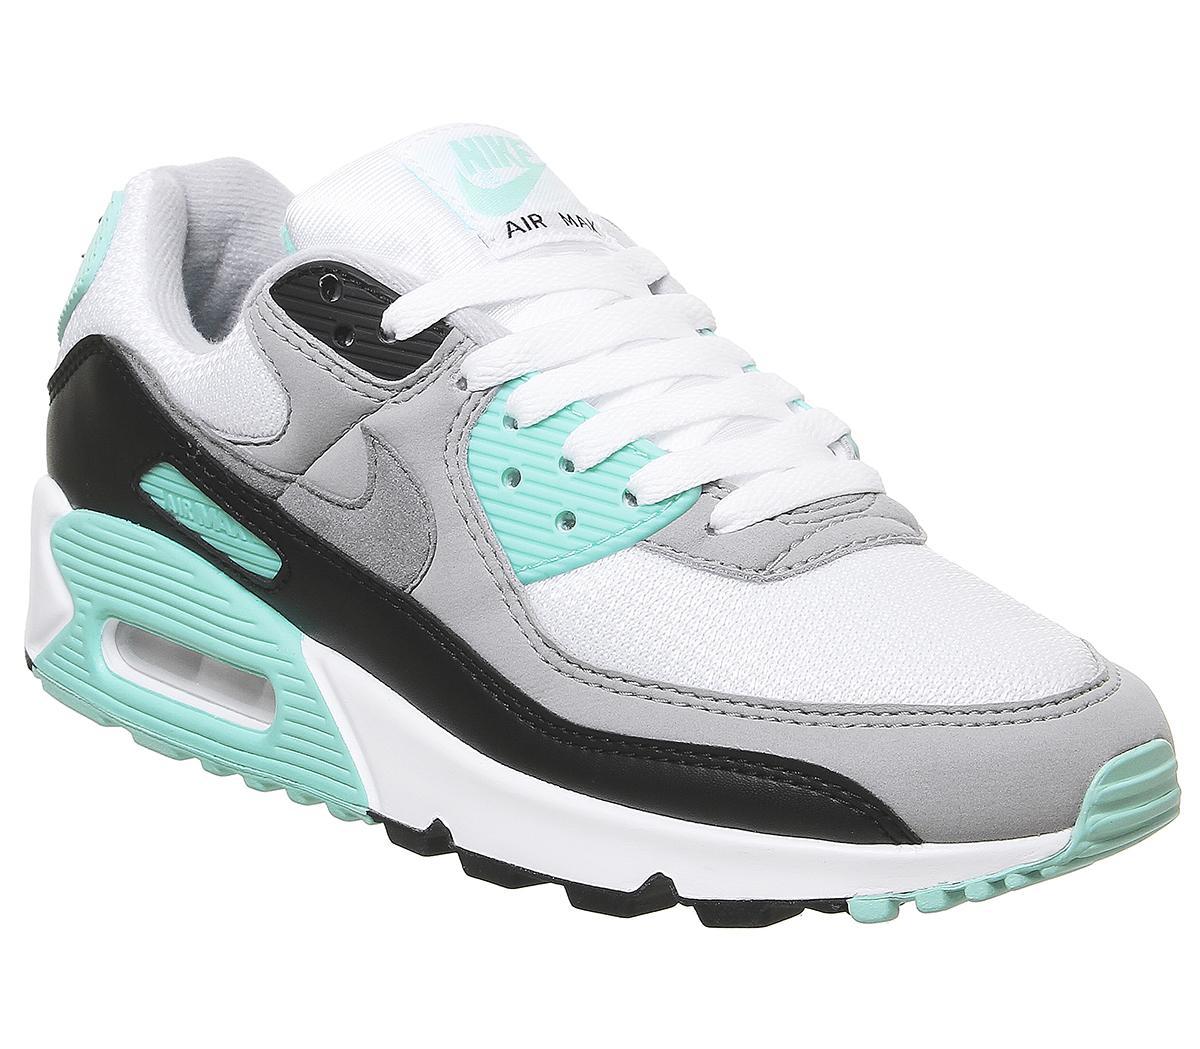 Nike Air Max 90 Trainers White Grey